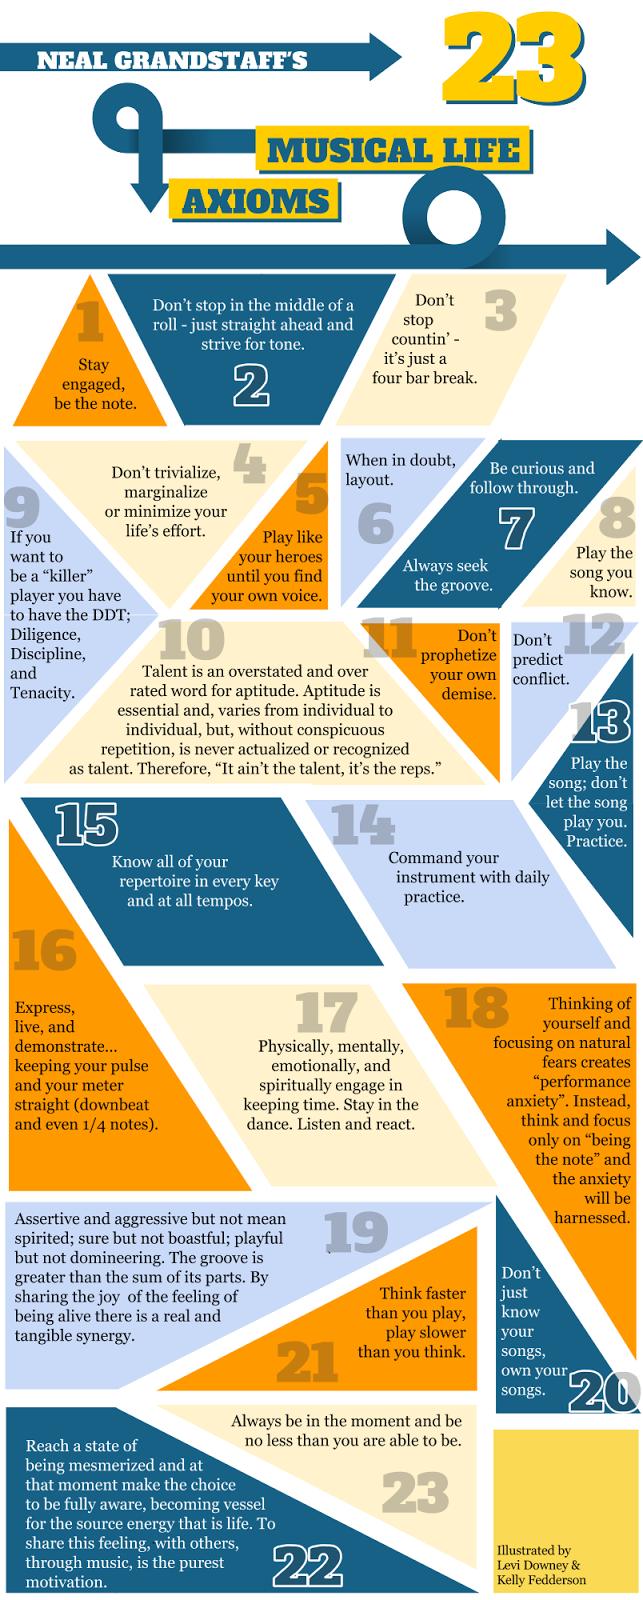 Neal Grandstaff's 23 Axioms